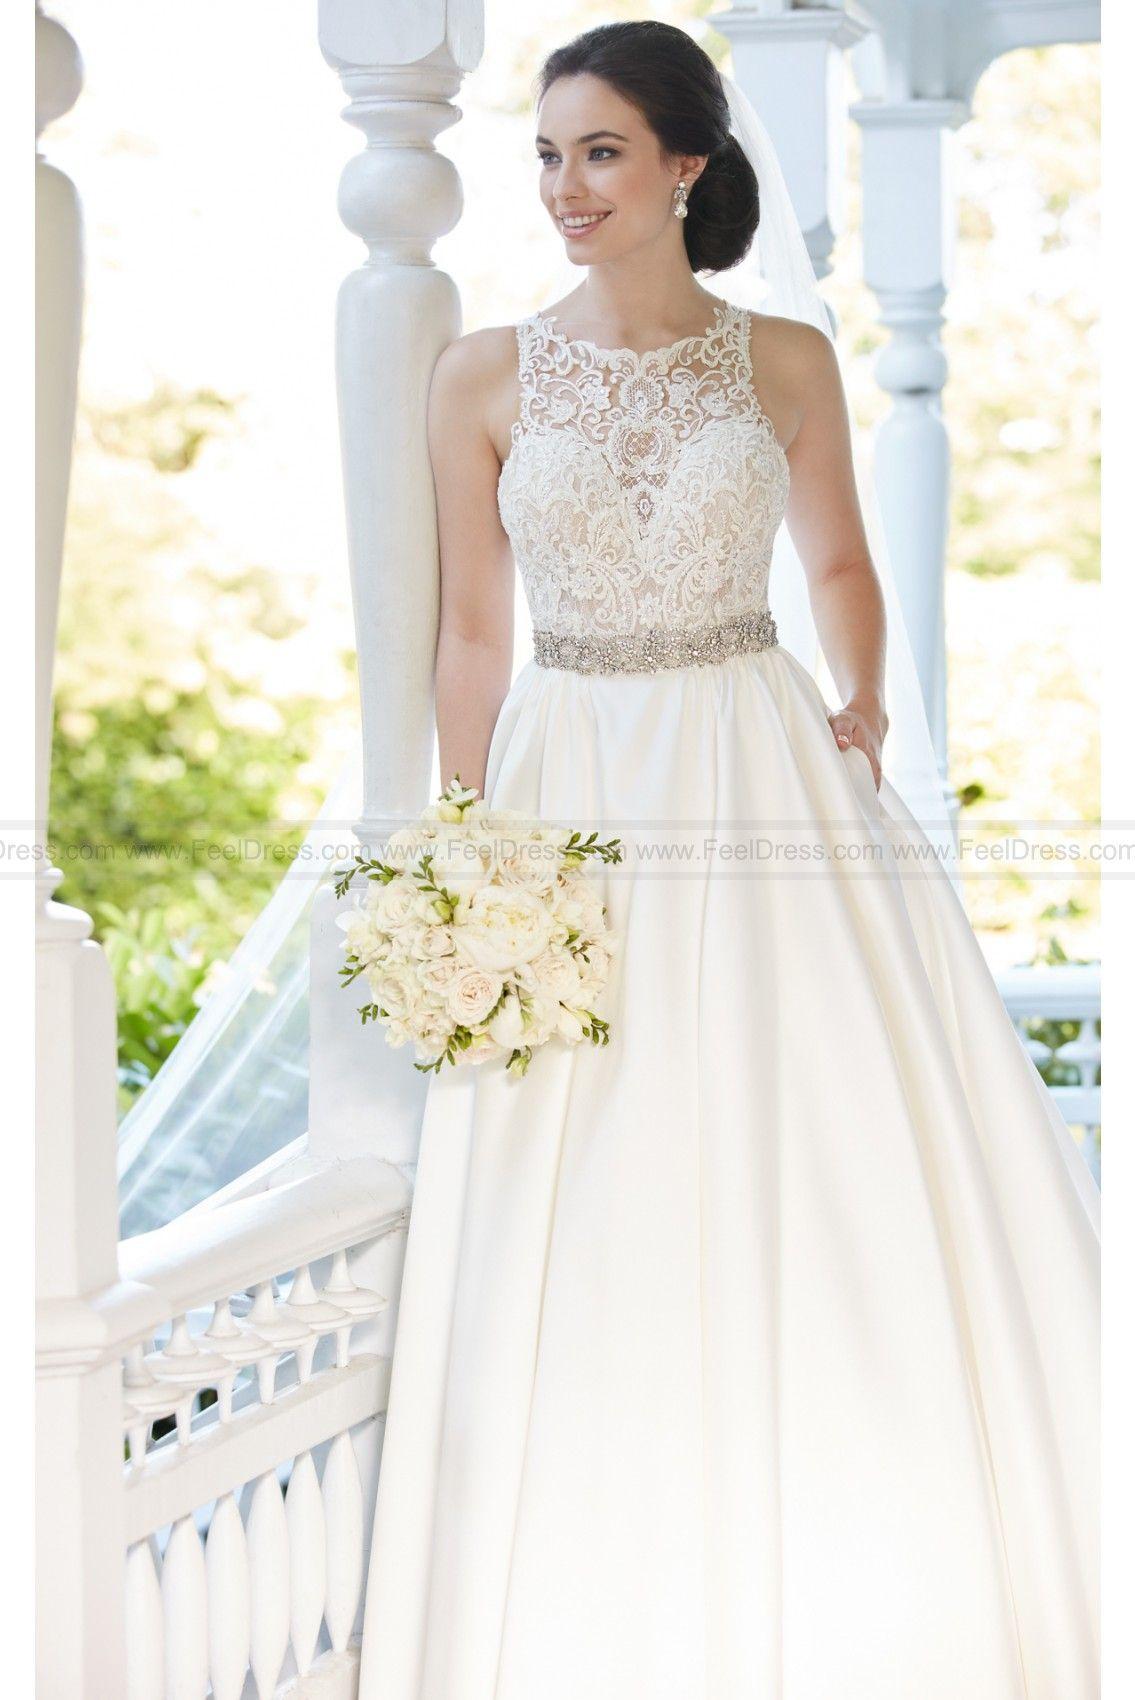 Martina liana trendy ball gown wedding dress separates style brody